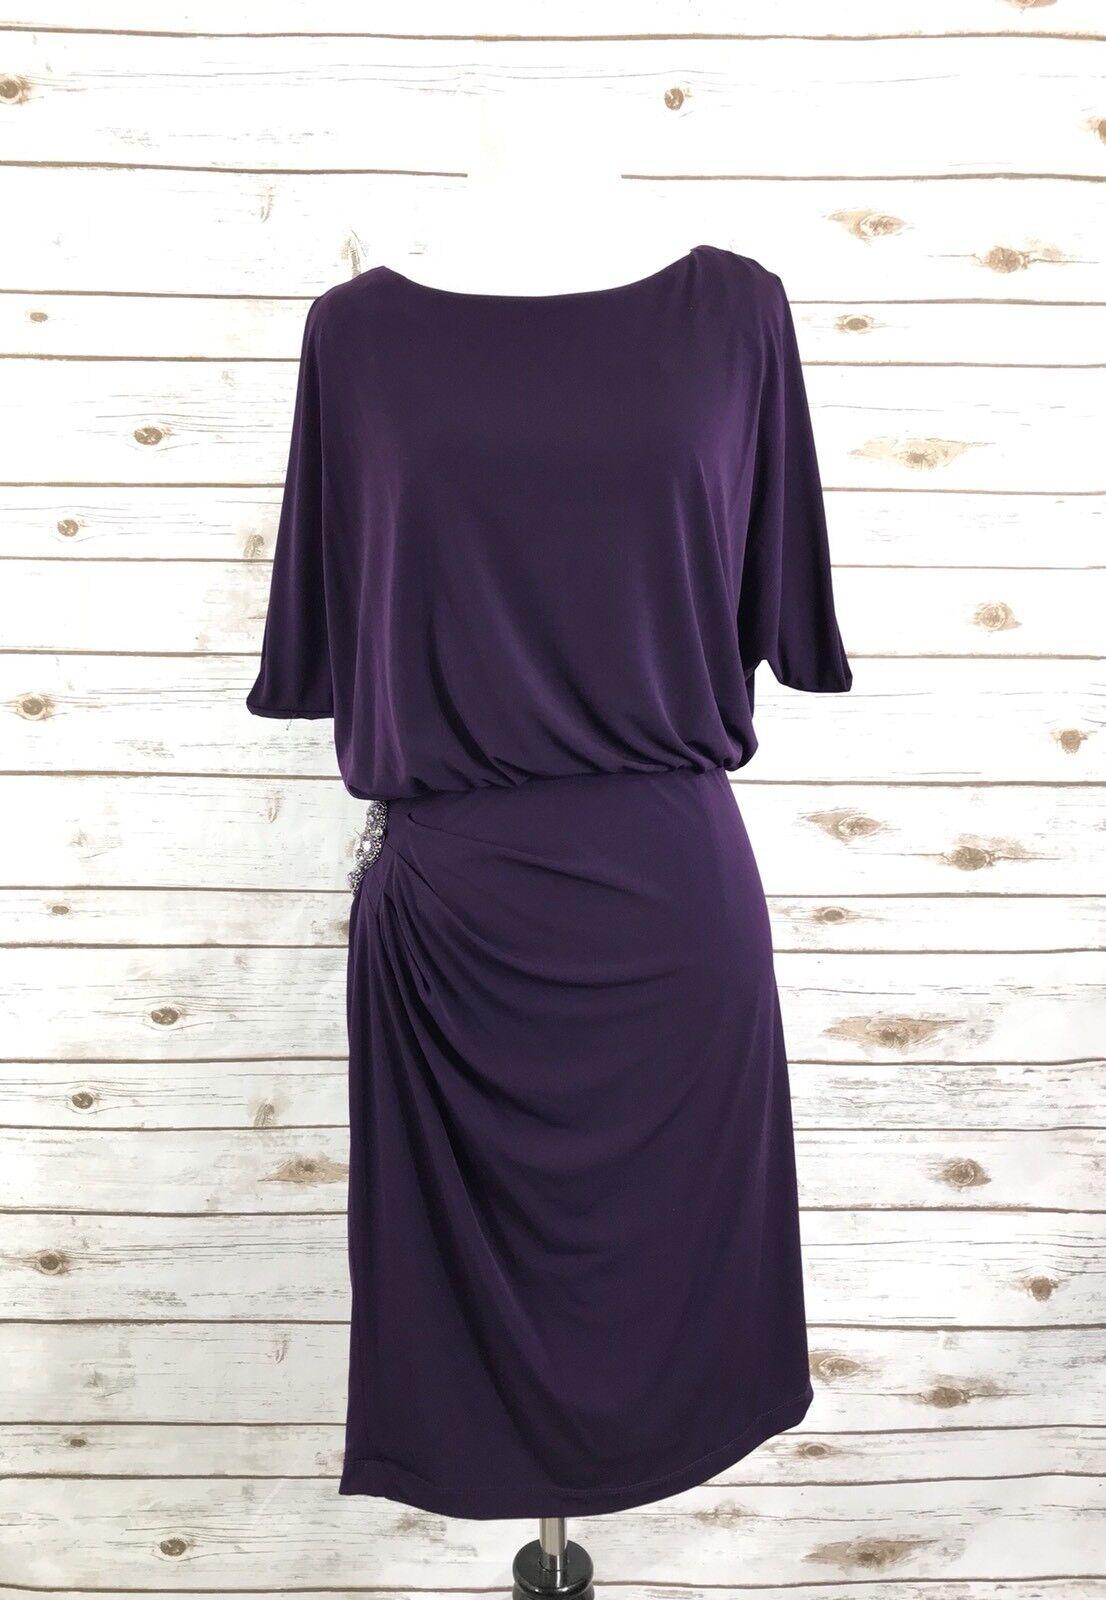 Eliza J Purple Jeweled Blouson Dress Sz 6